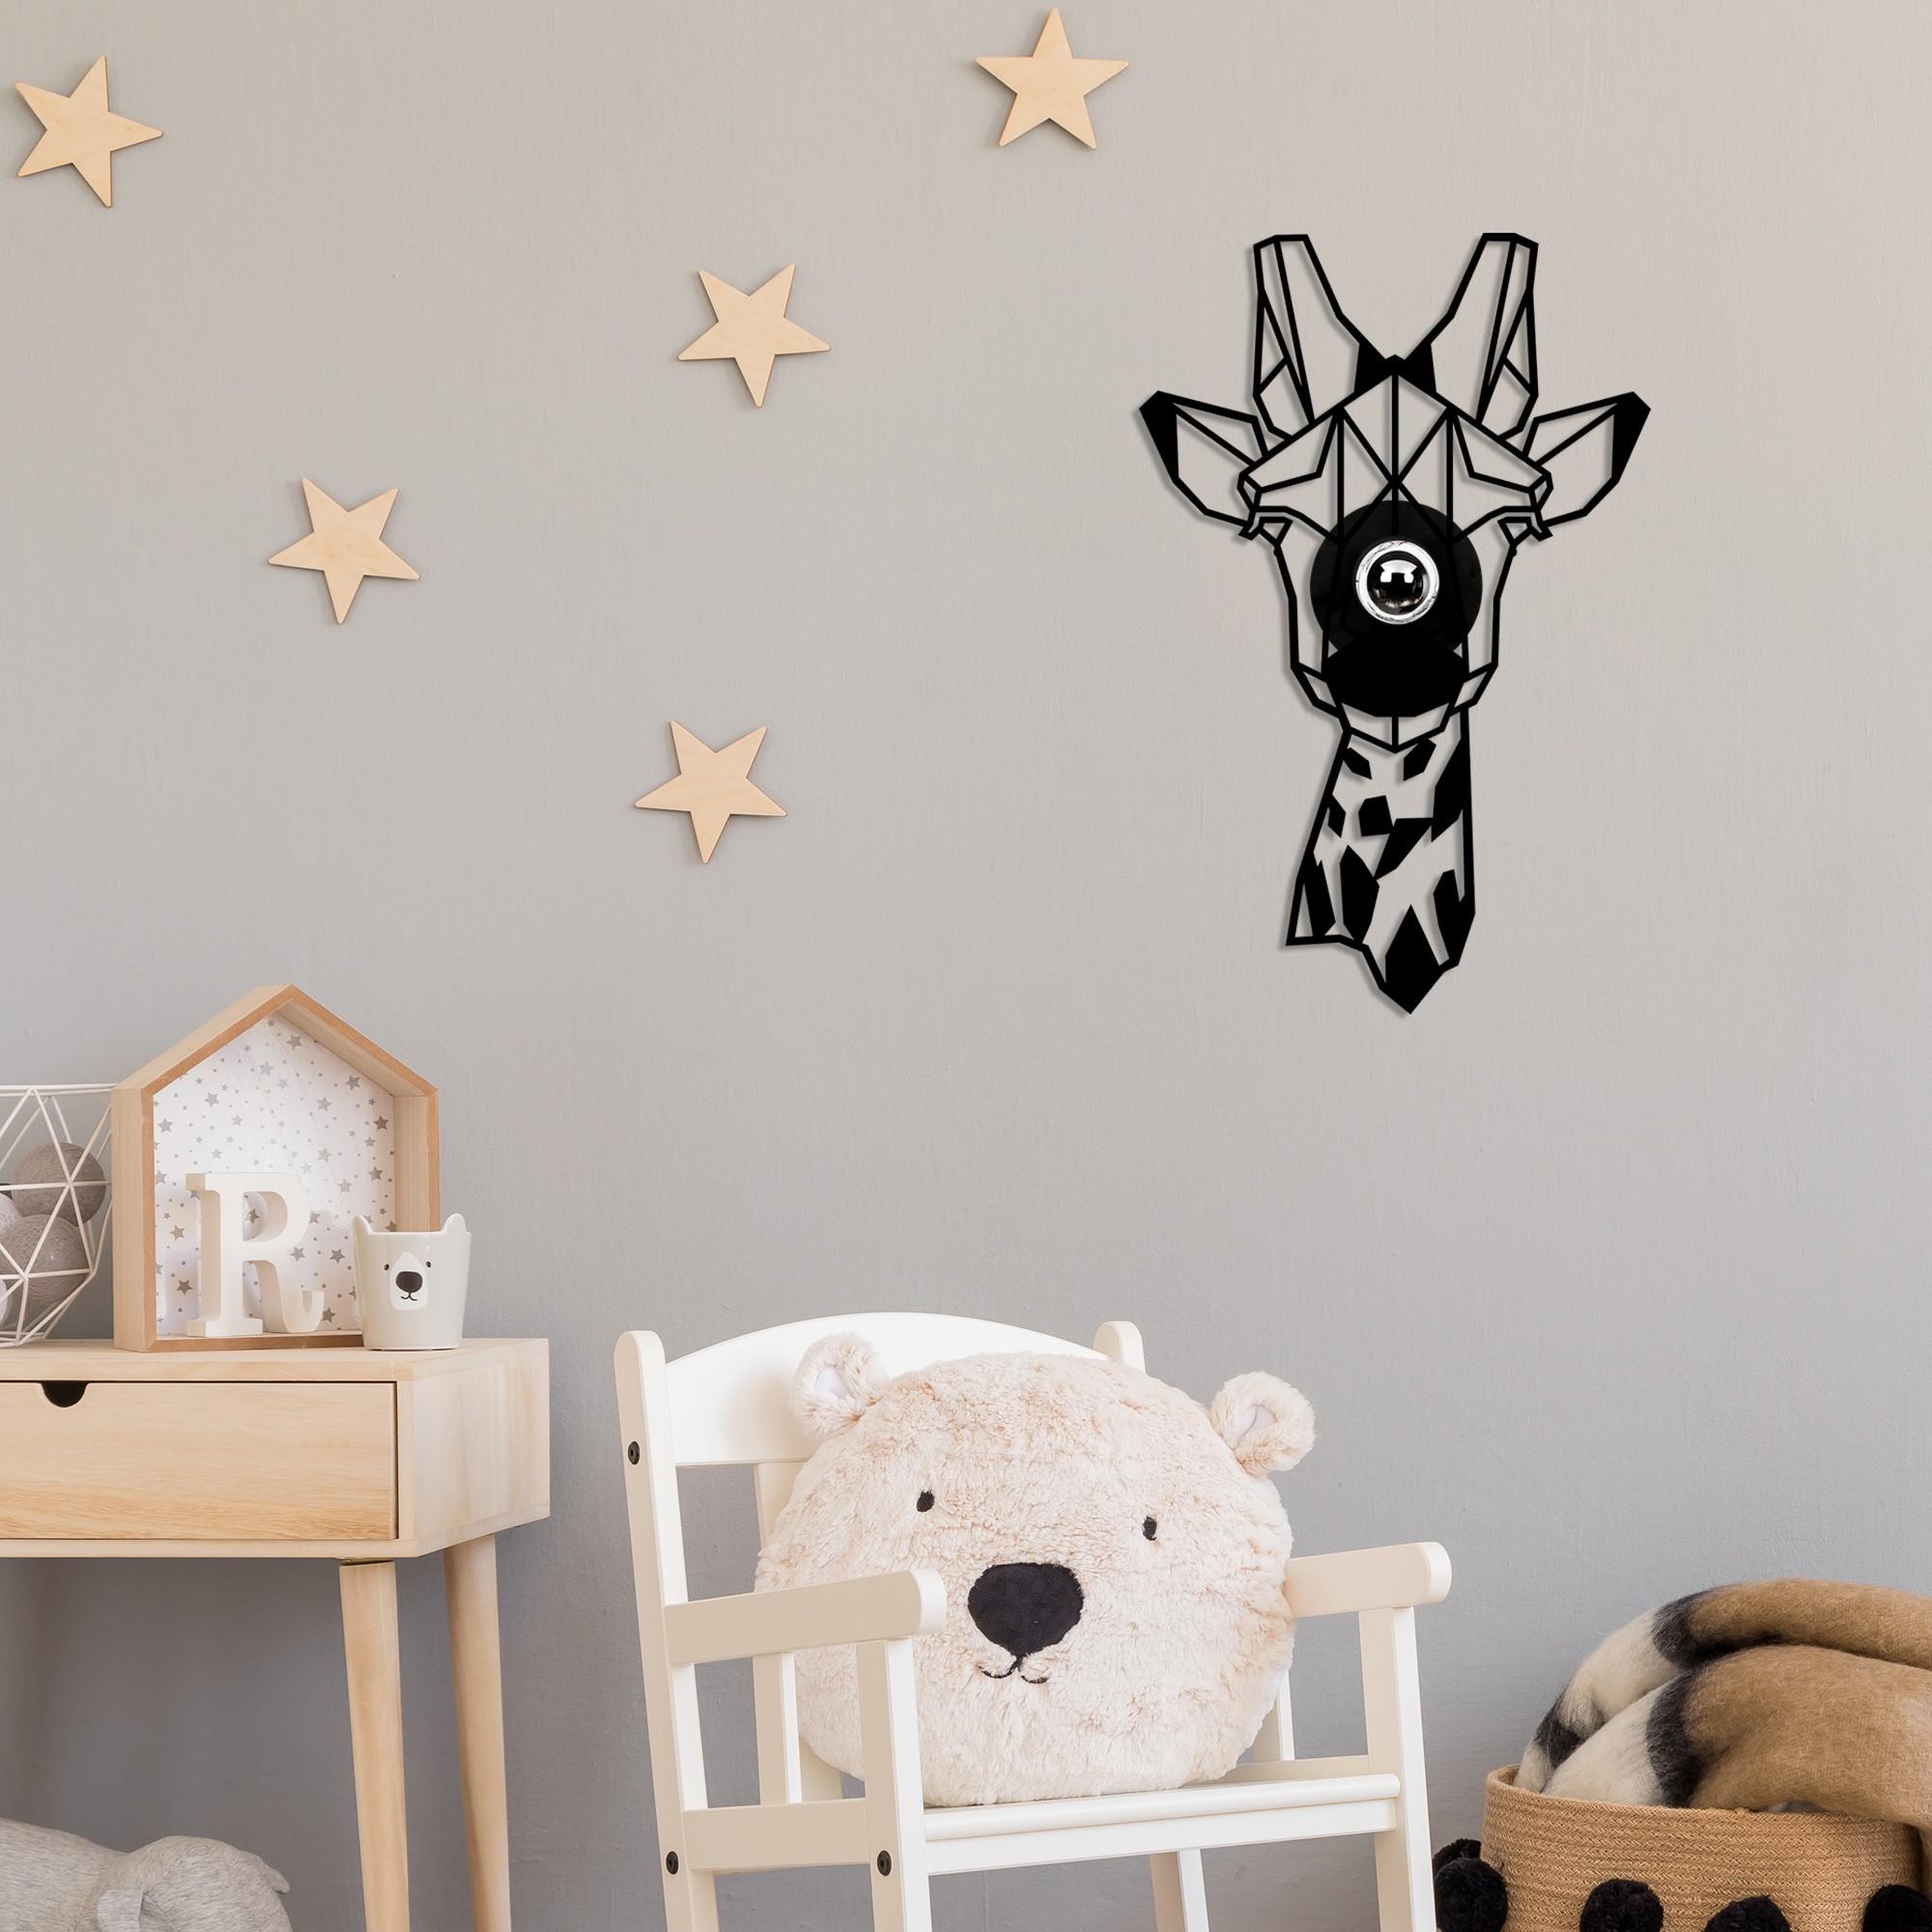 LED industriële wanddeco lamp dieren - Giraf - dimbaar - E27 fitting - sfeerfoto